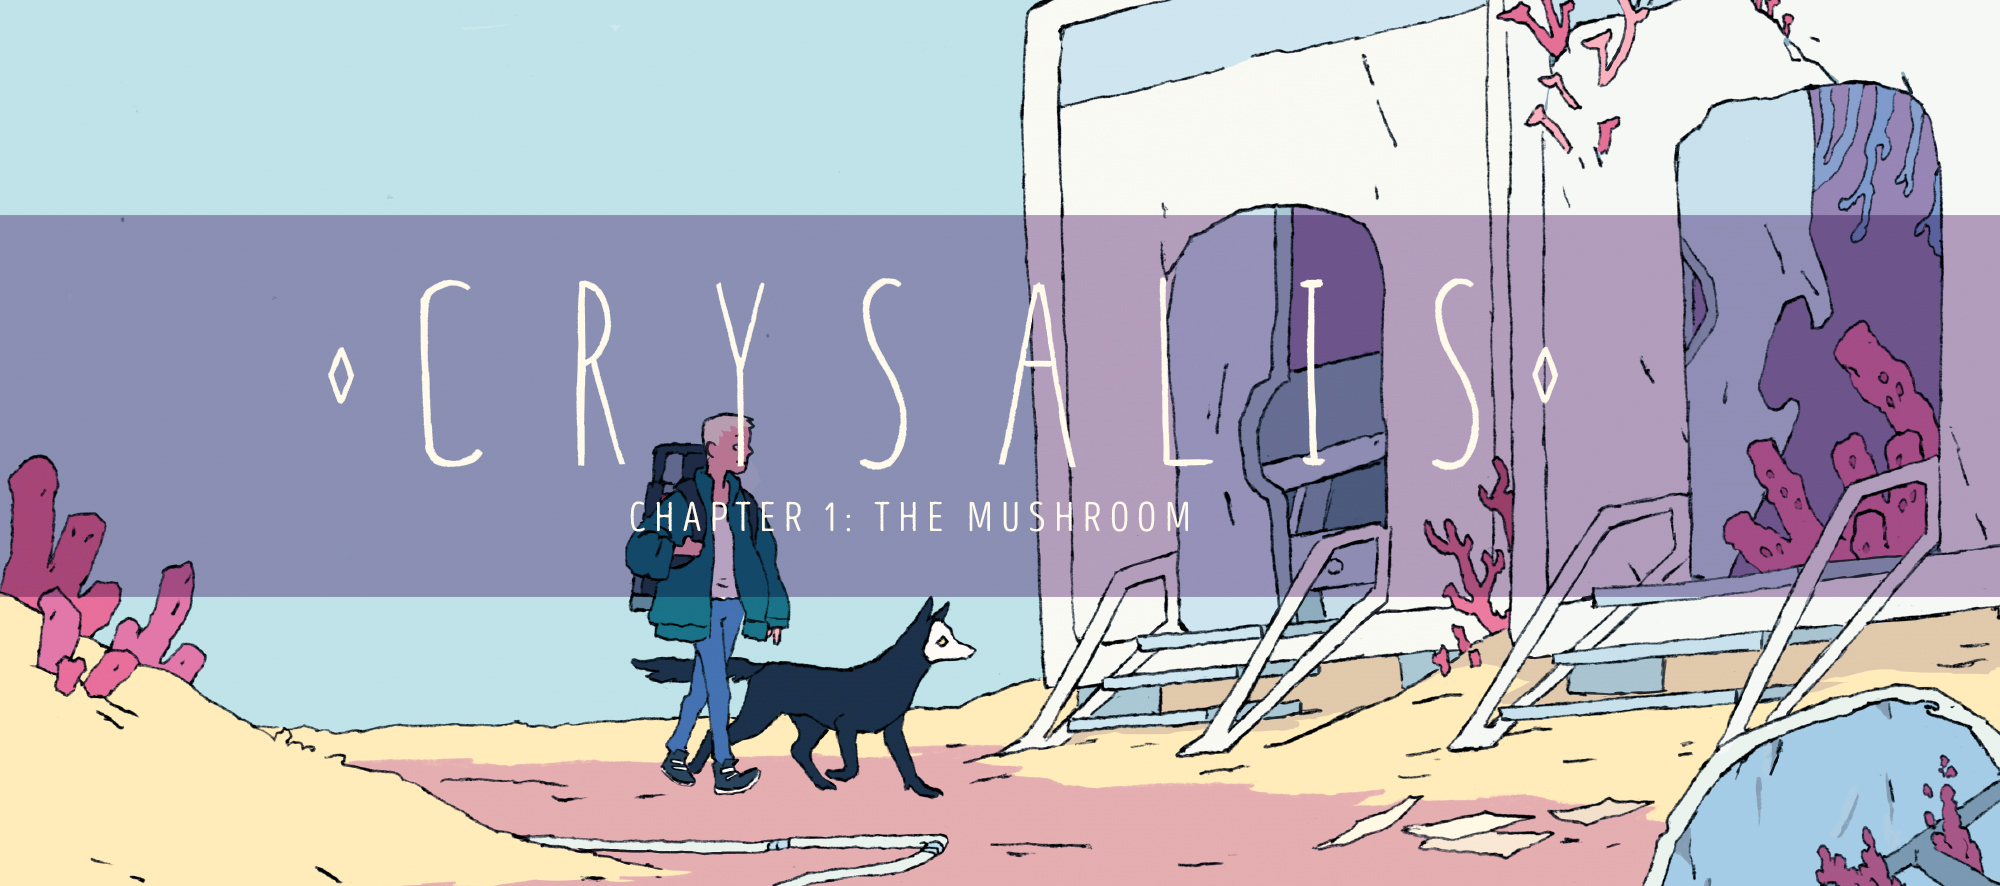 Crysalis: Chapter 1